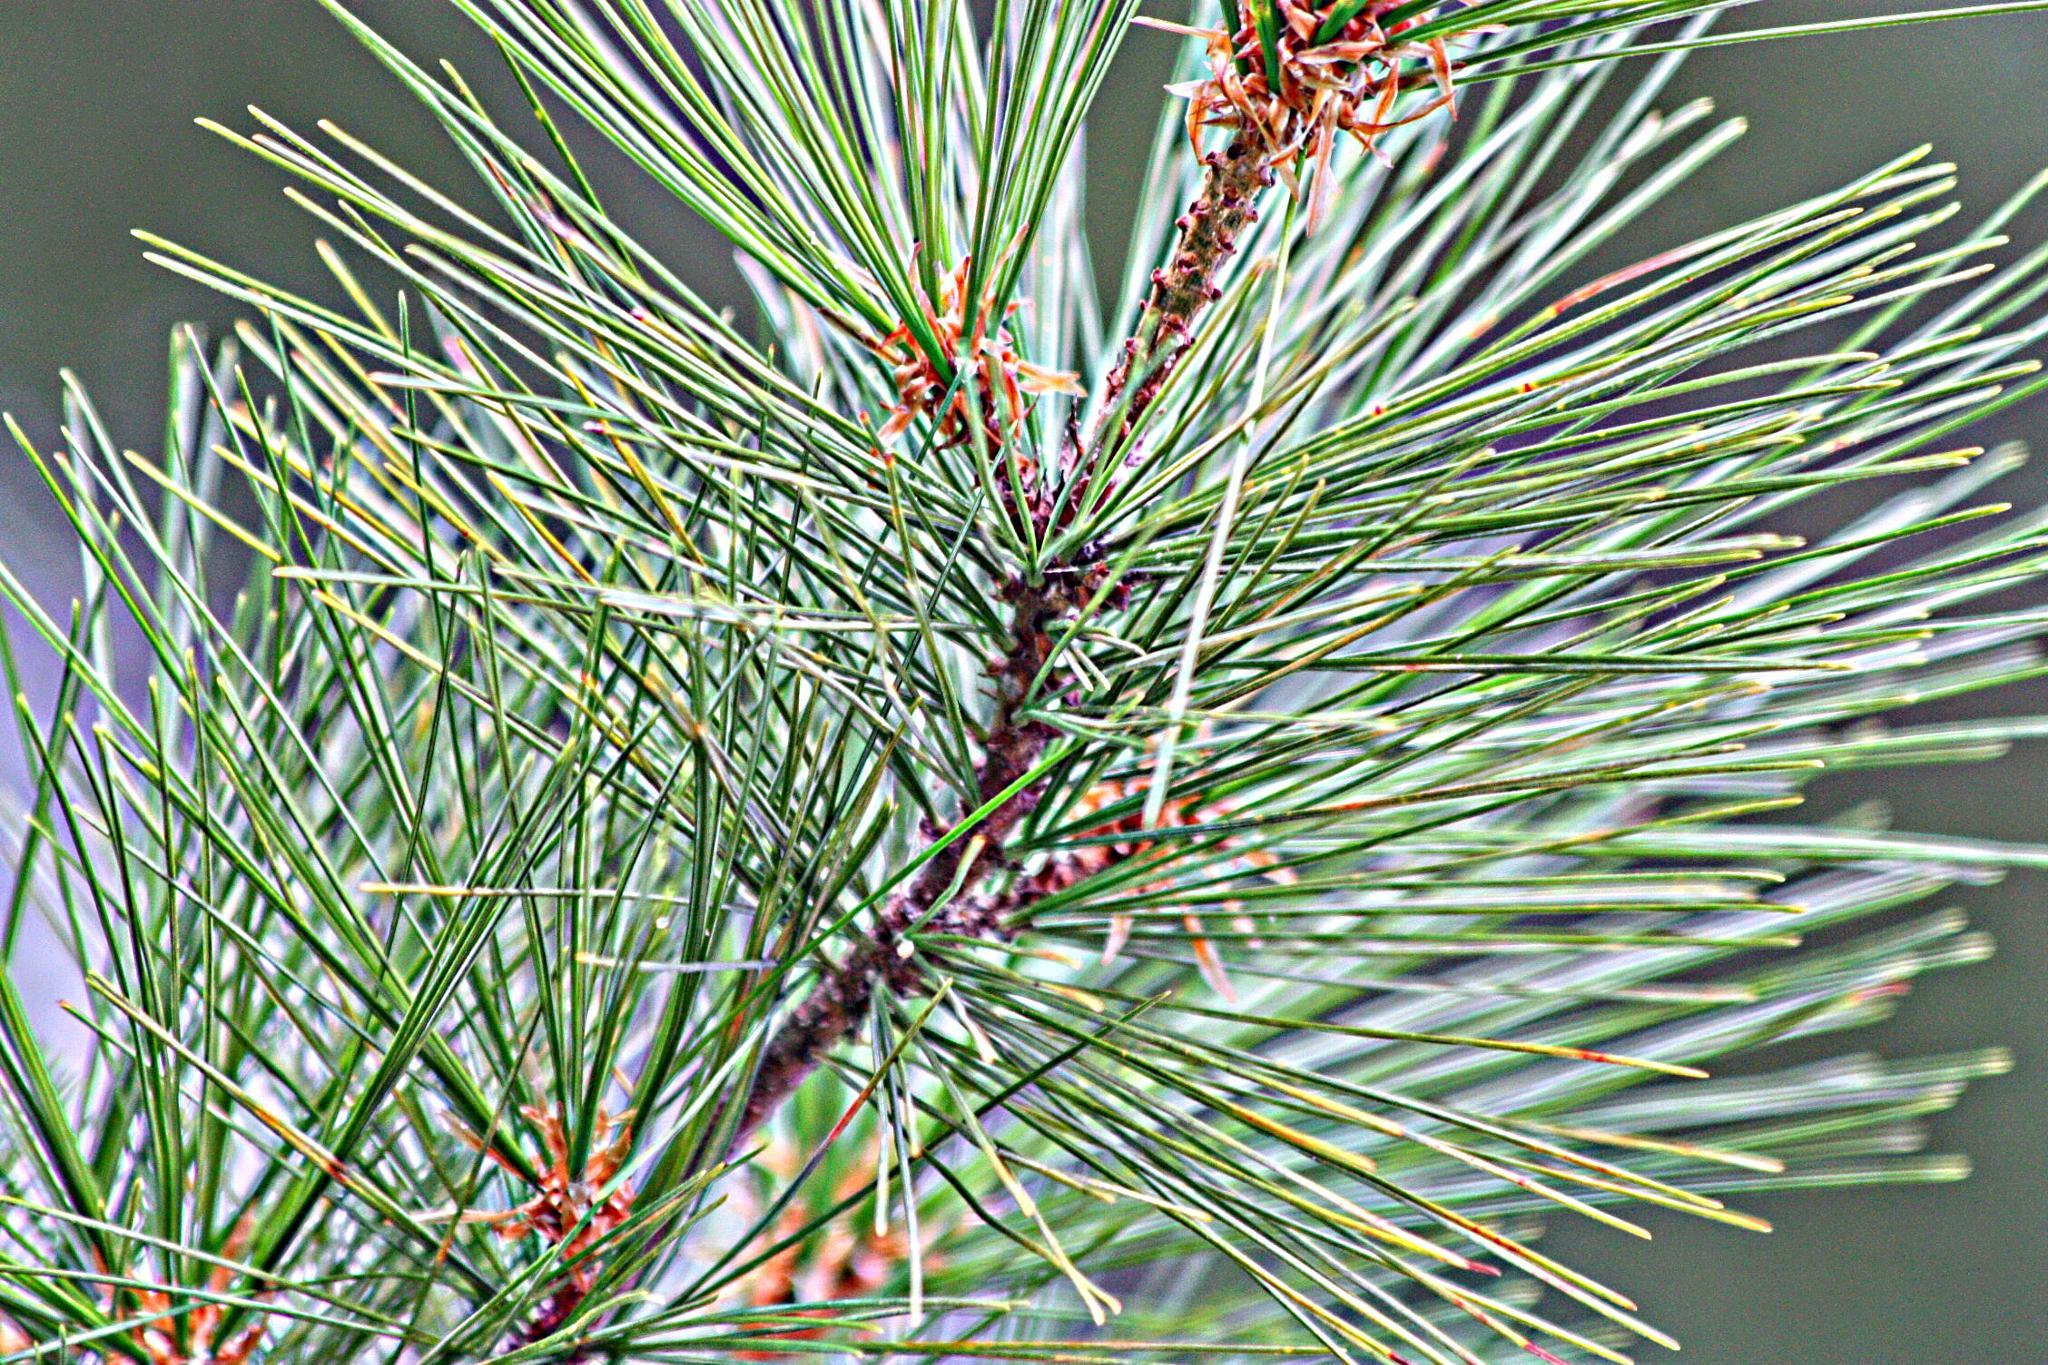 Pine by Jon Radtke